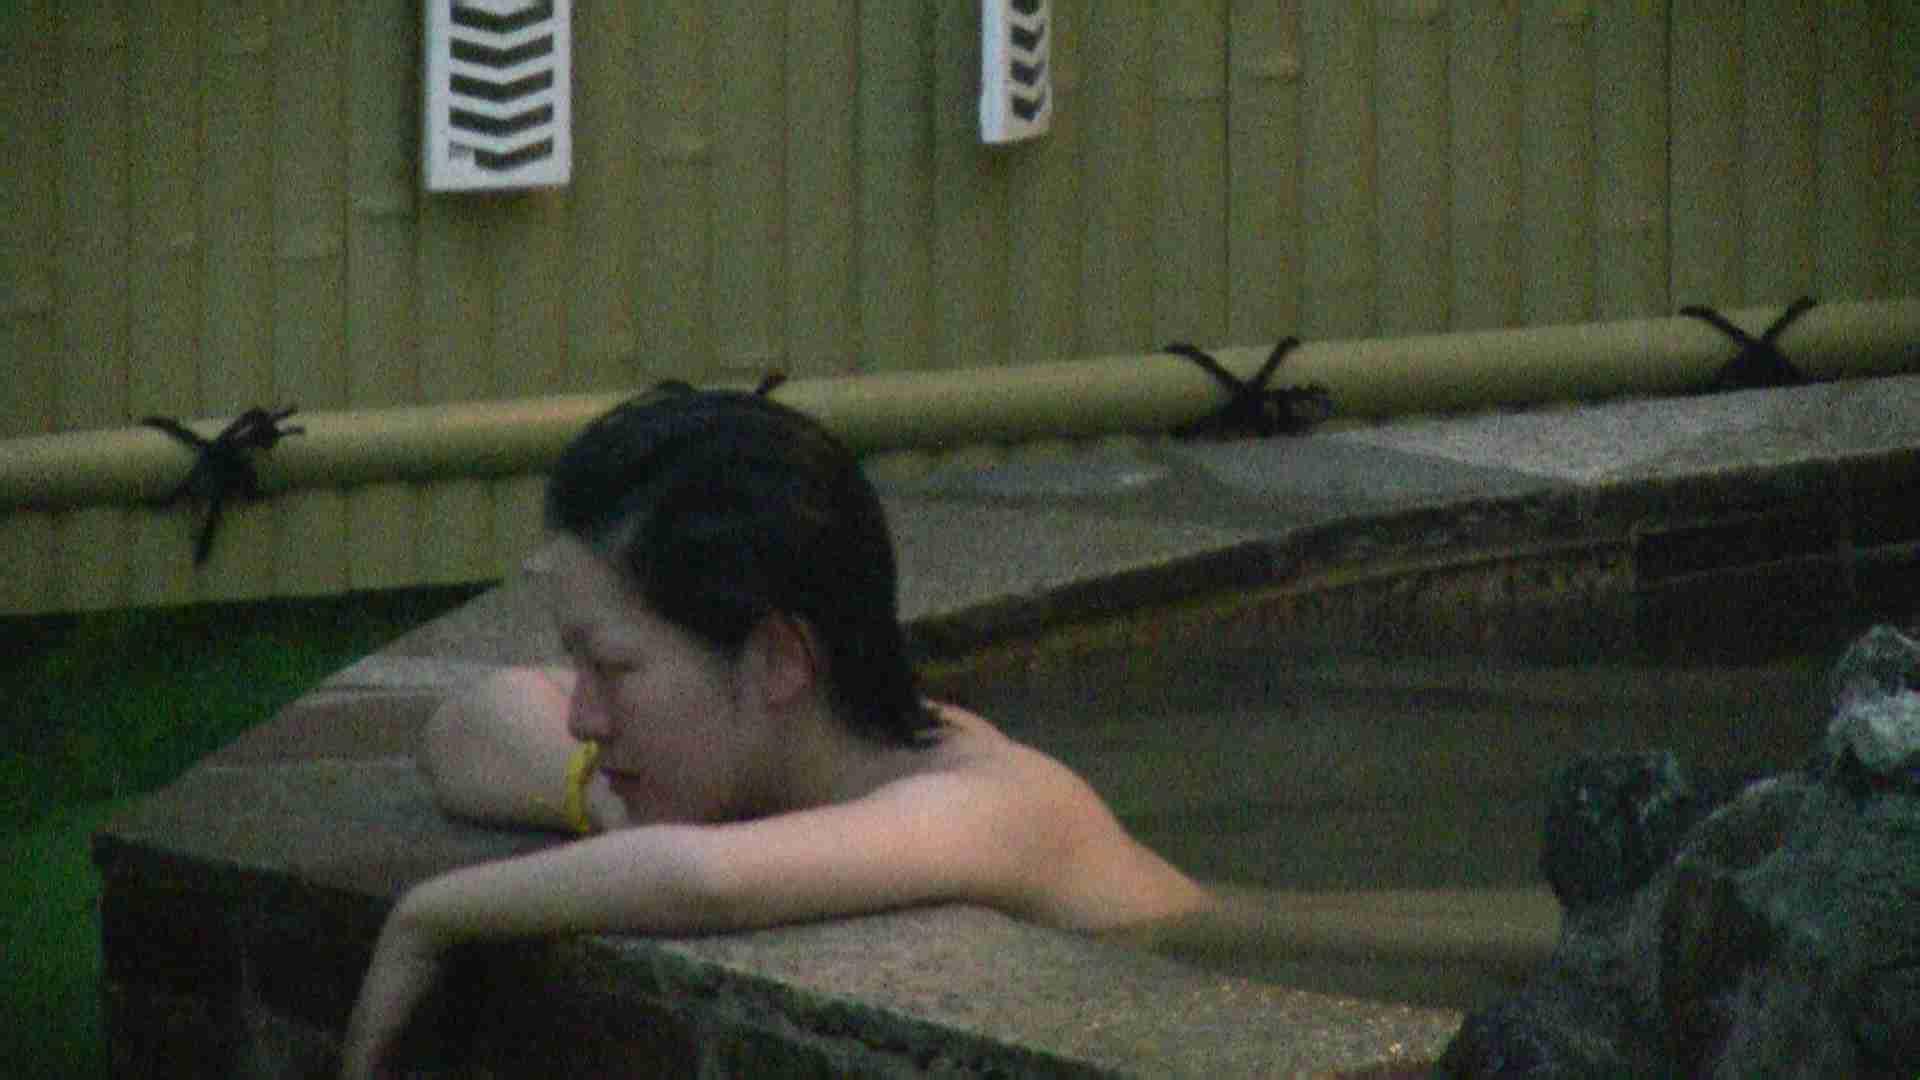 Aquaな露天風呂Vol.05【VIP】 盗撮大放出 エロ画像 65連発 43